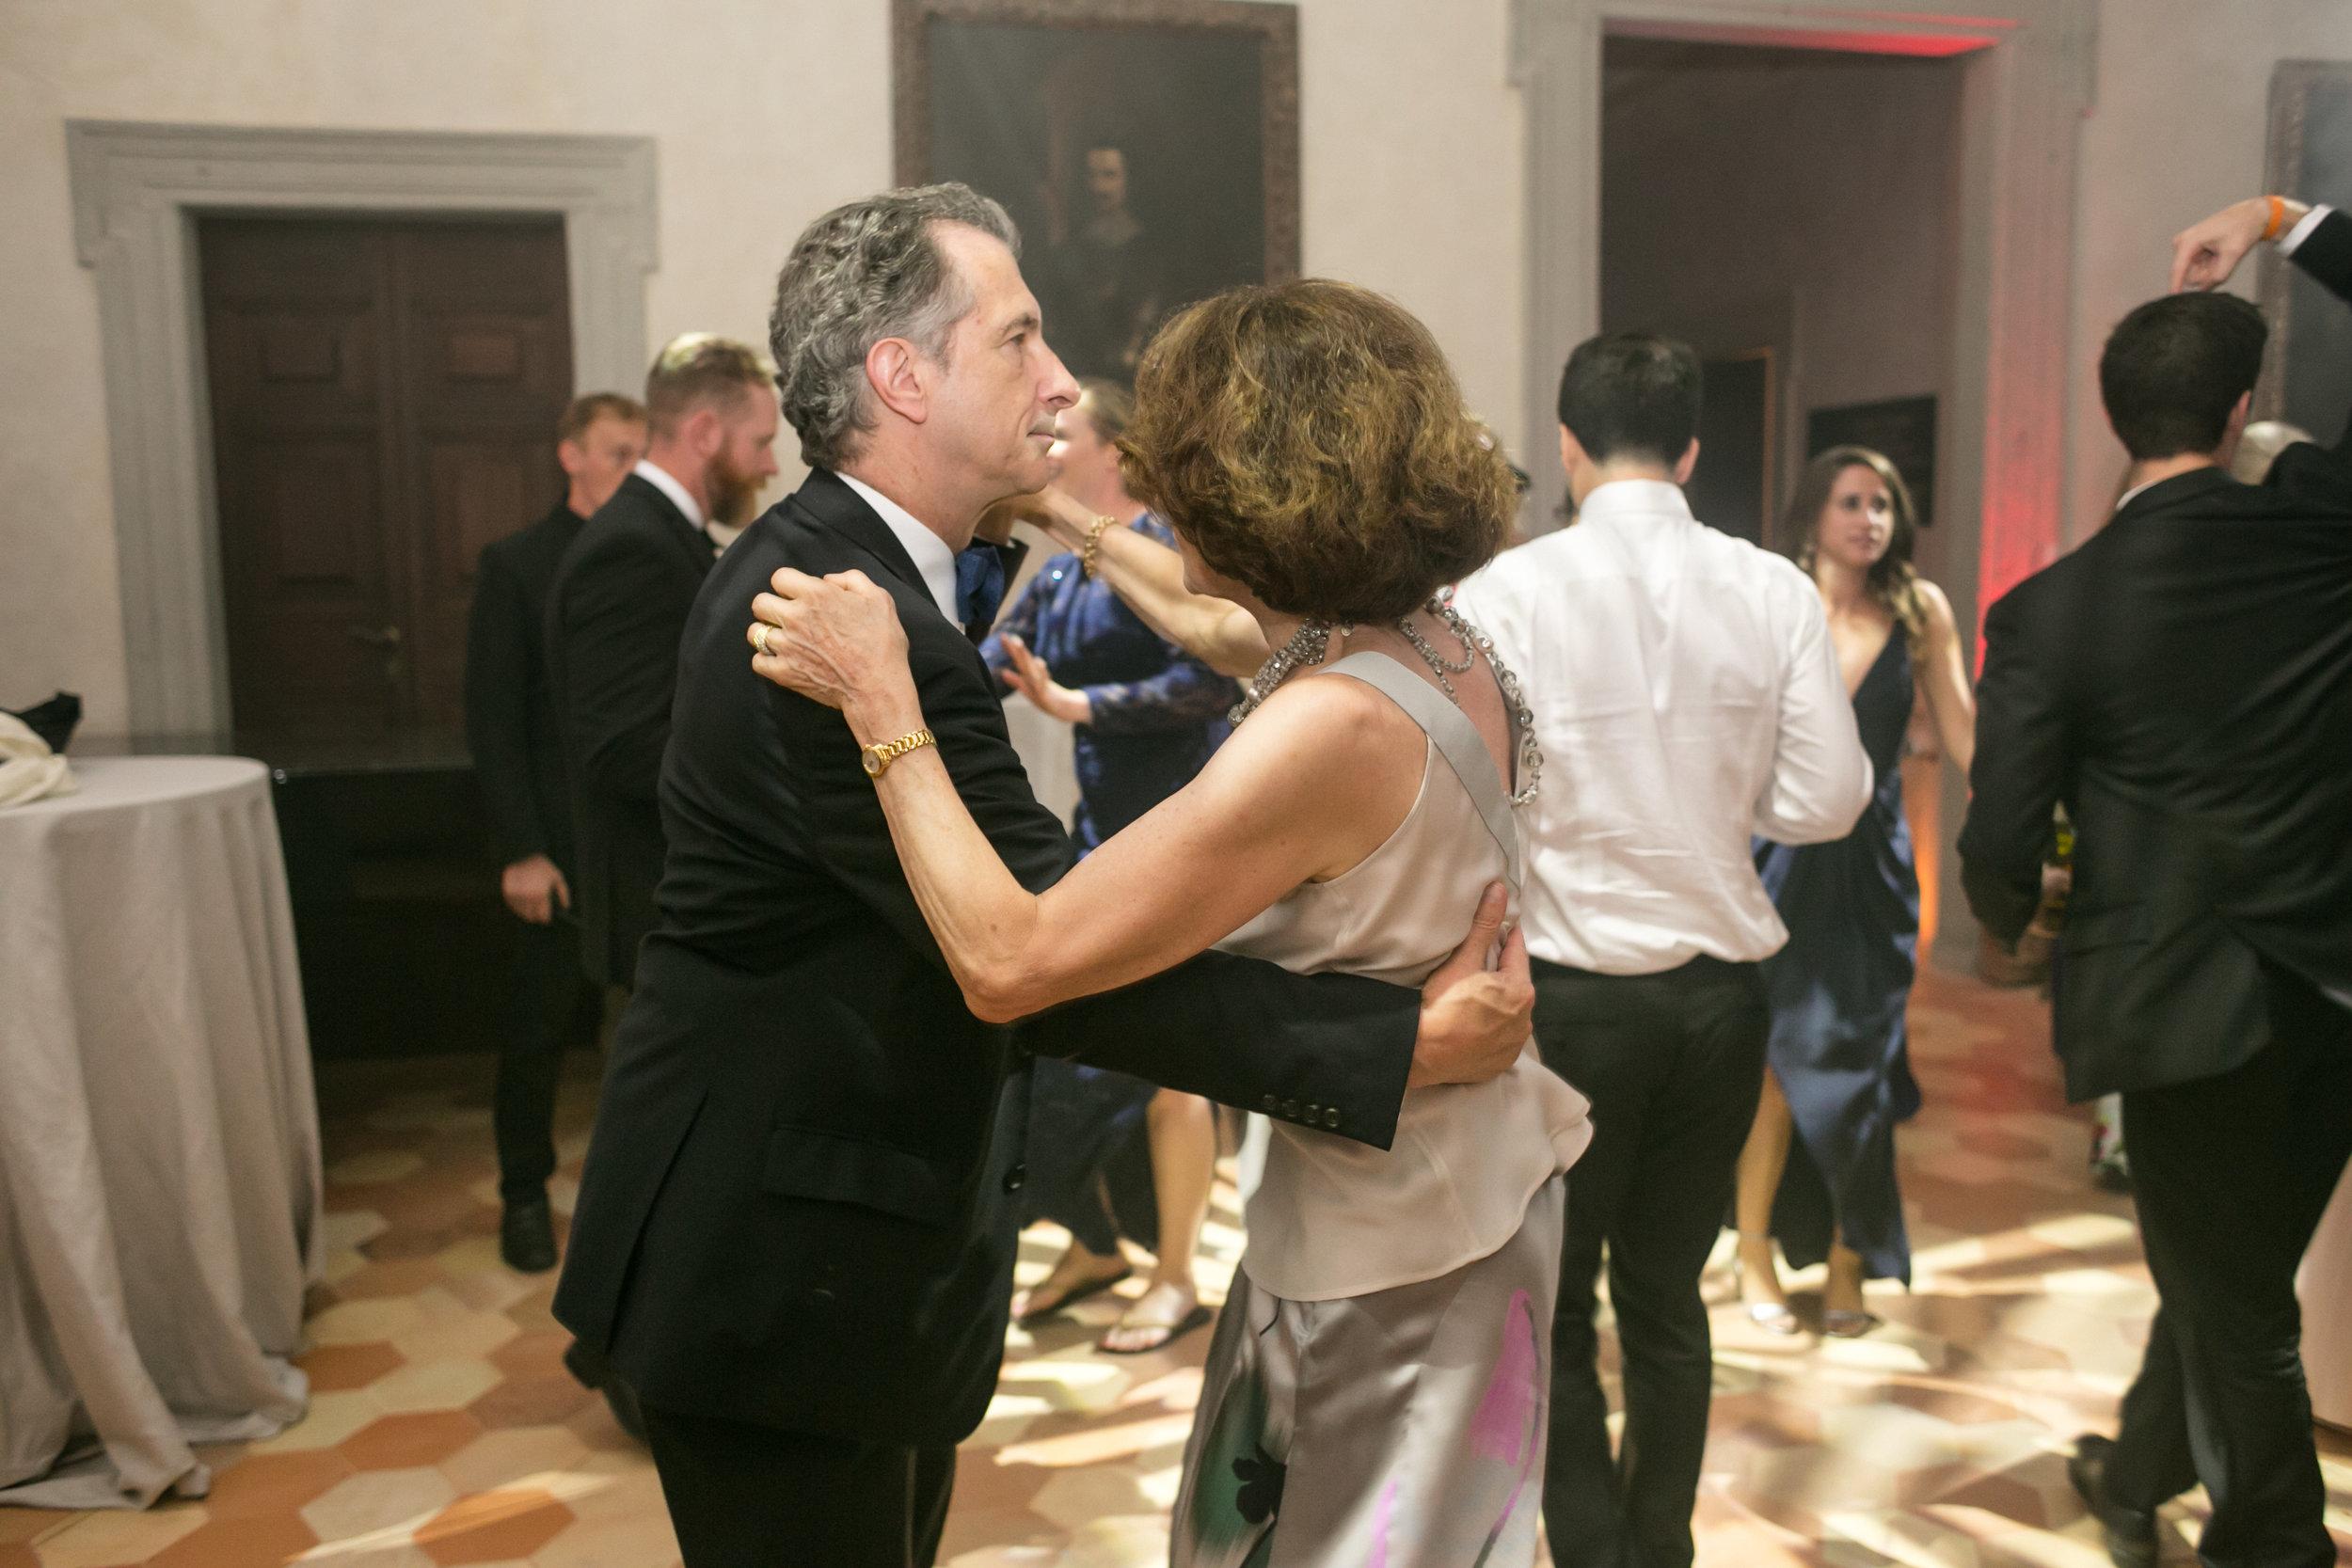 14_late night dancing-1487.jpg